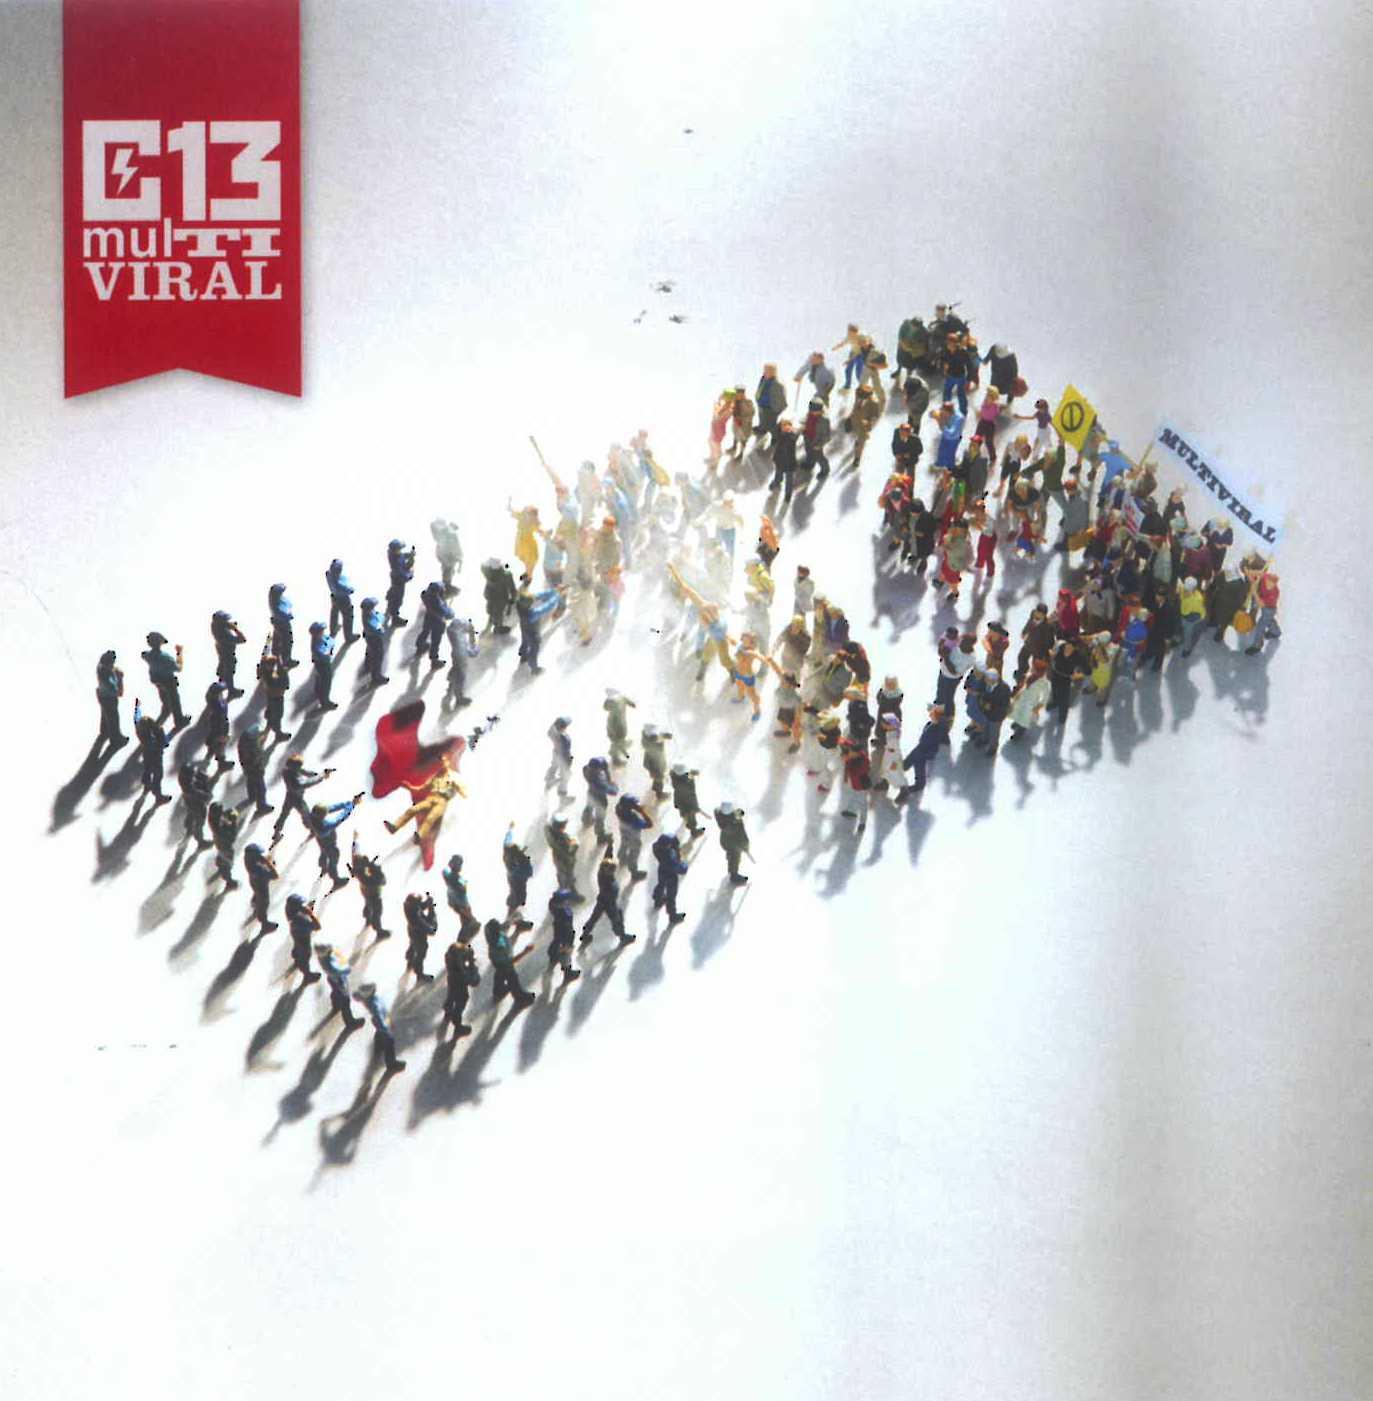 Multi viral